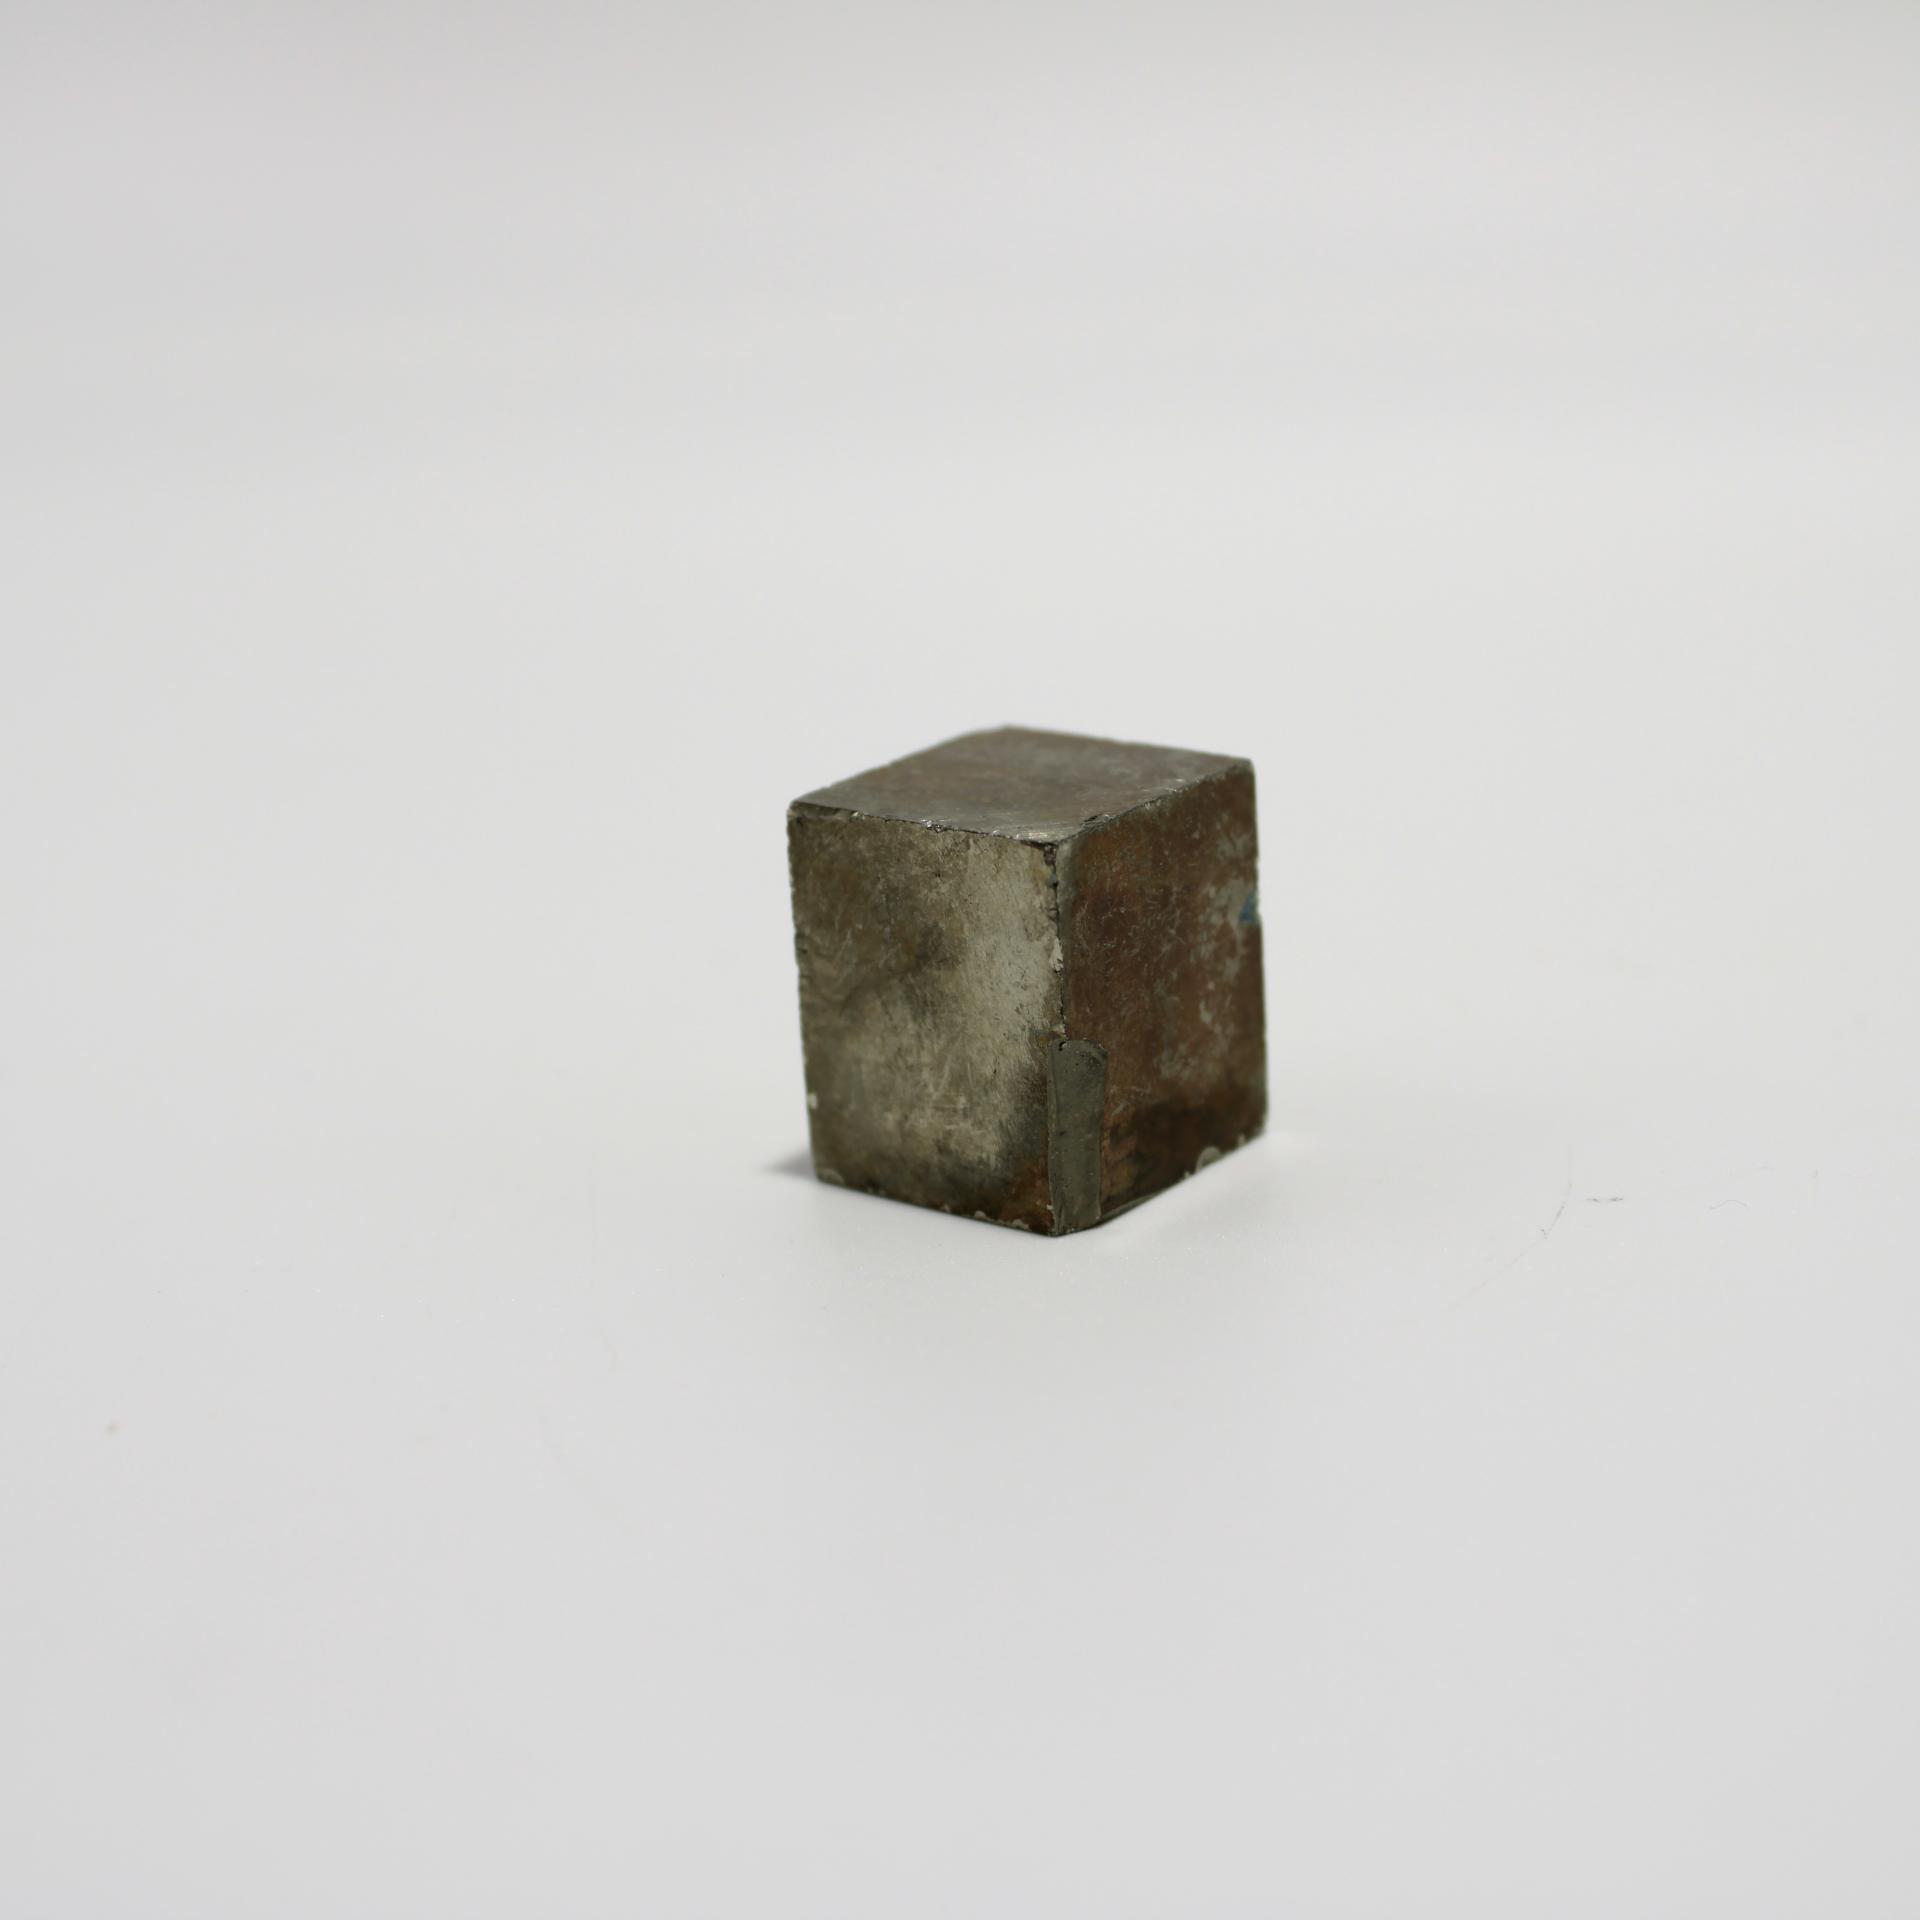 I79 pyritecube 4